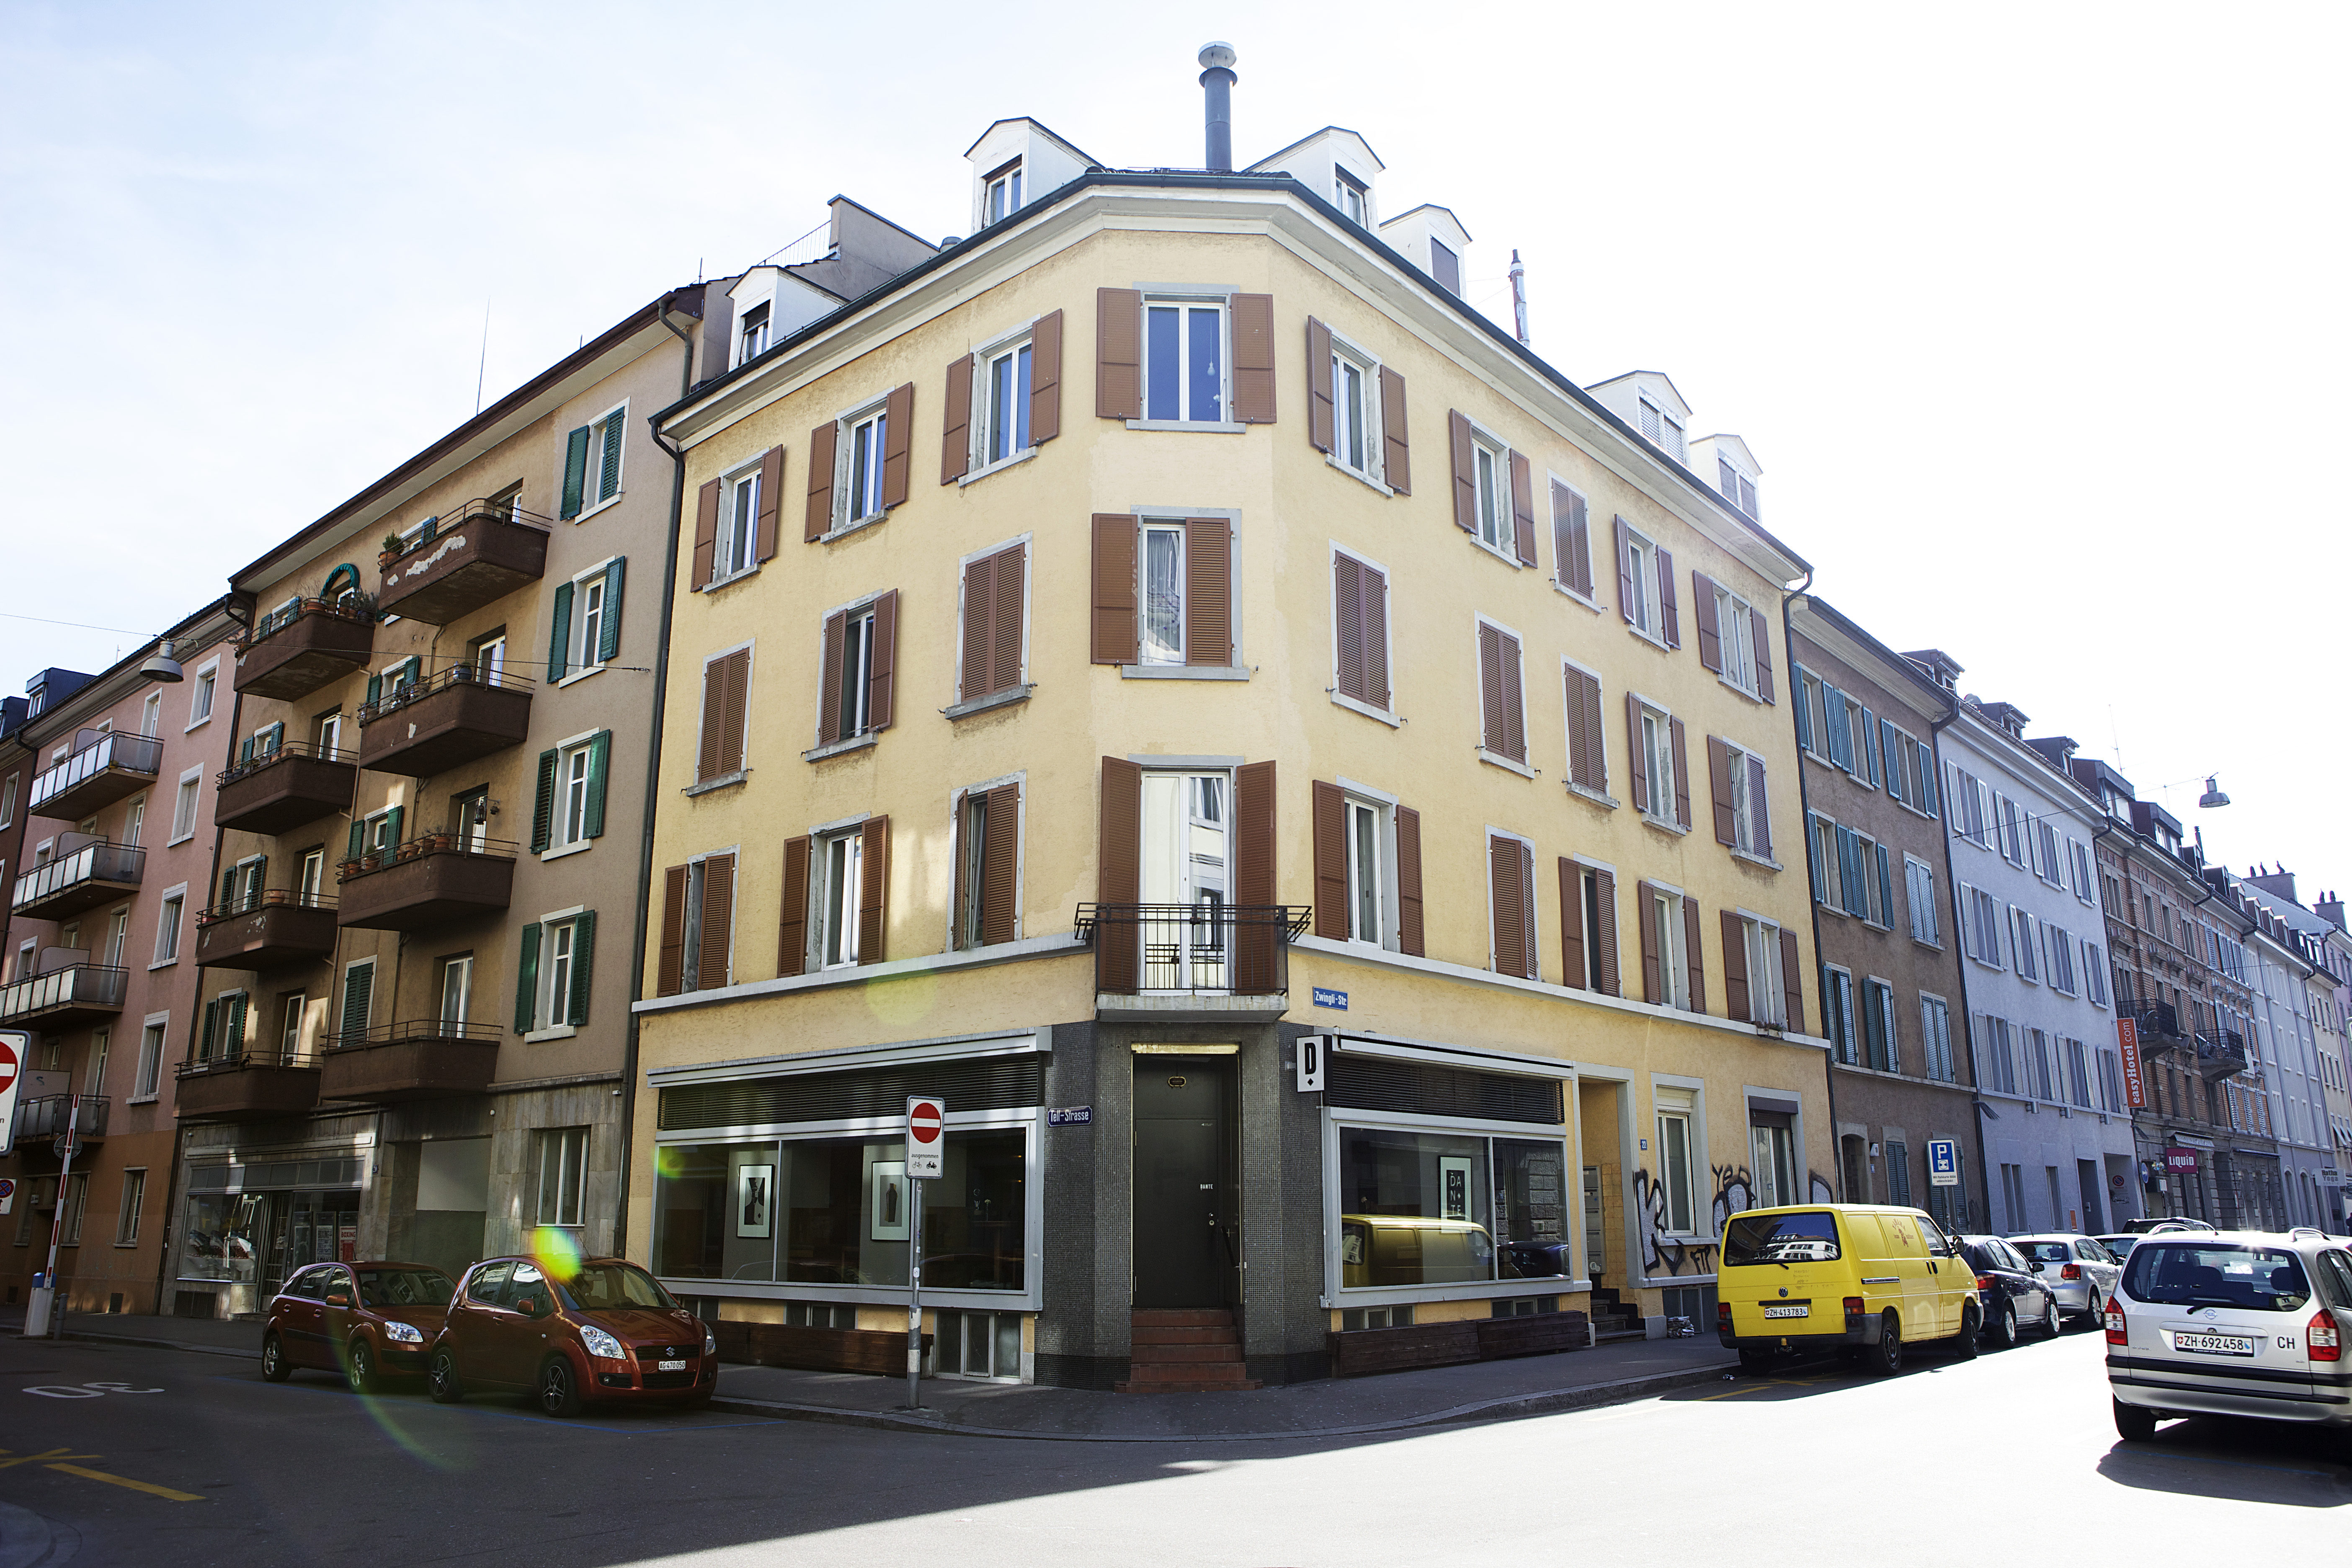 Tellhof_Fassade_Strasse 9